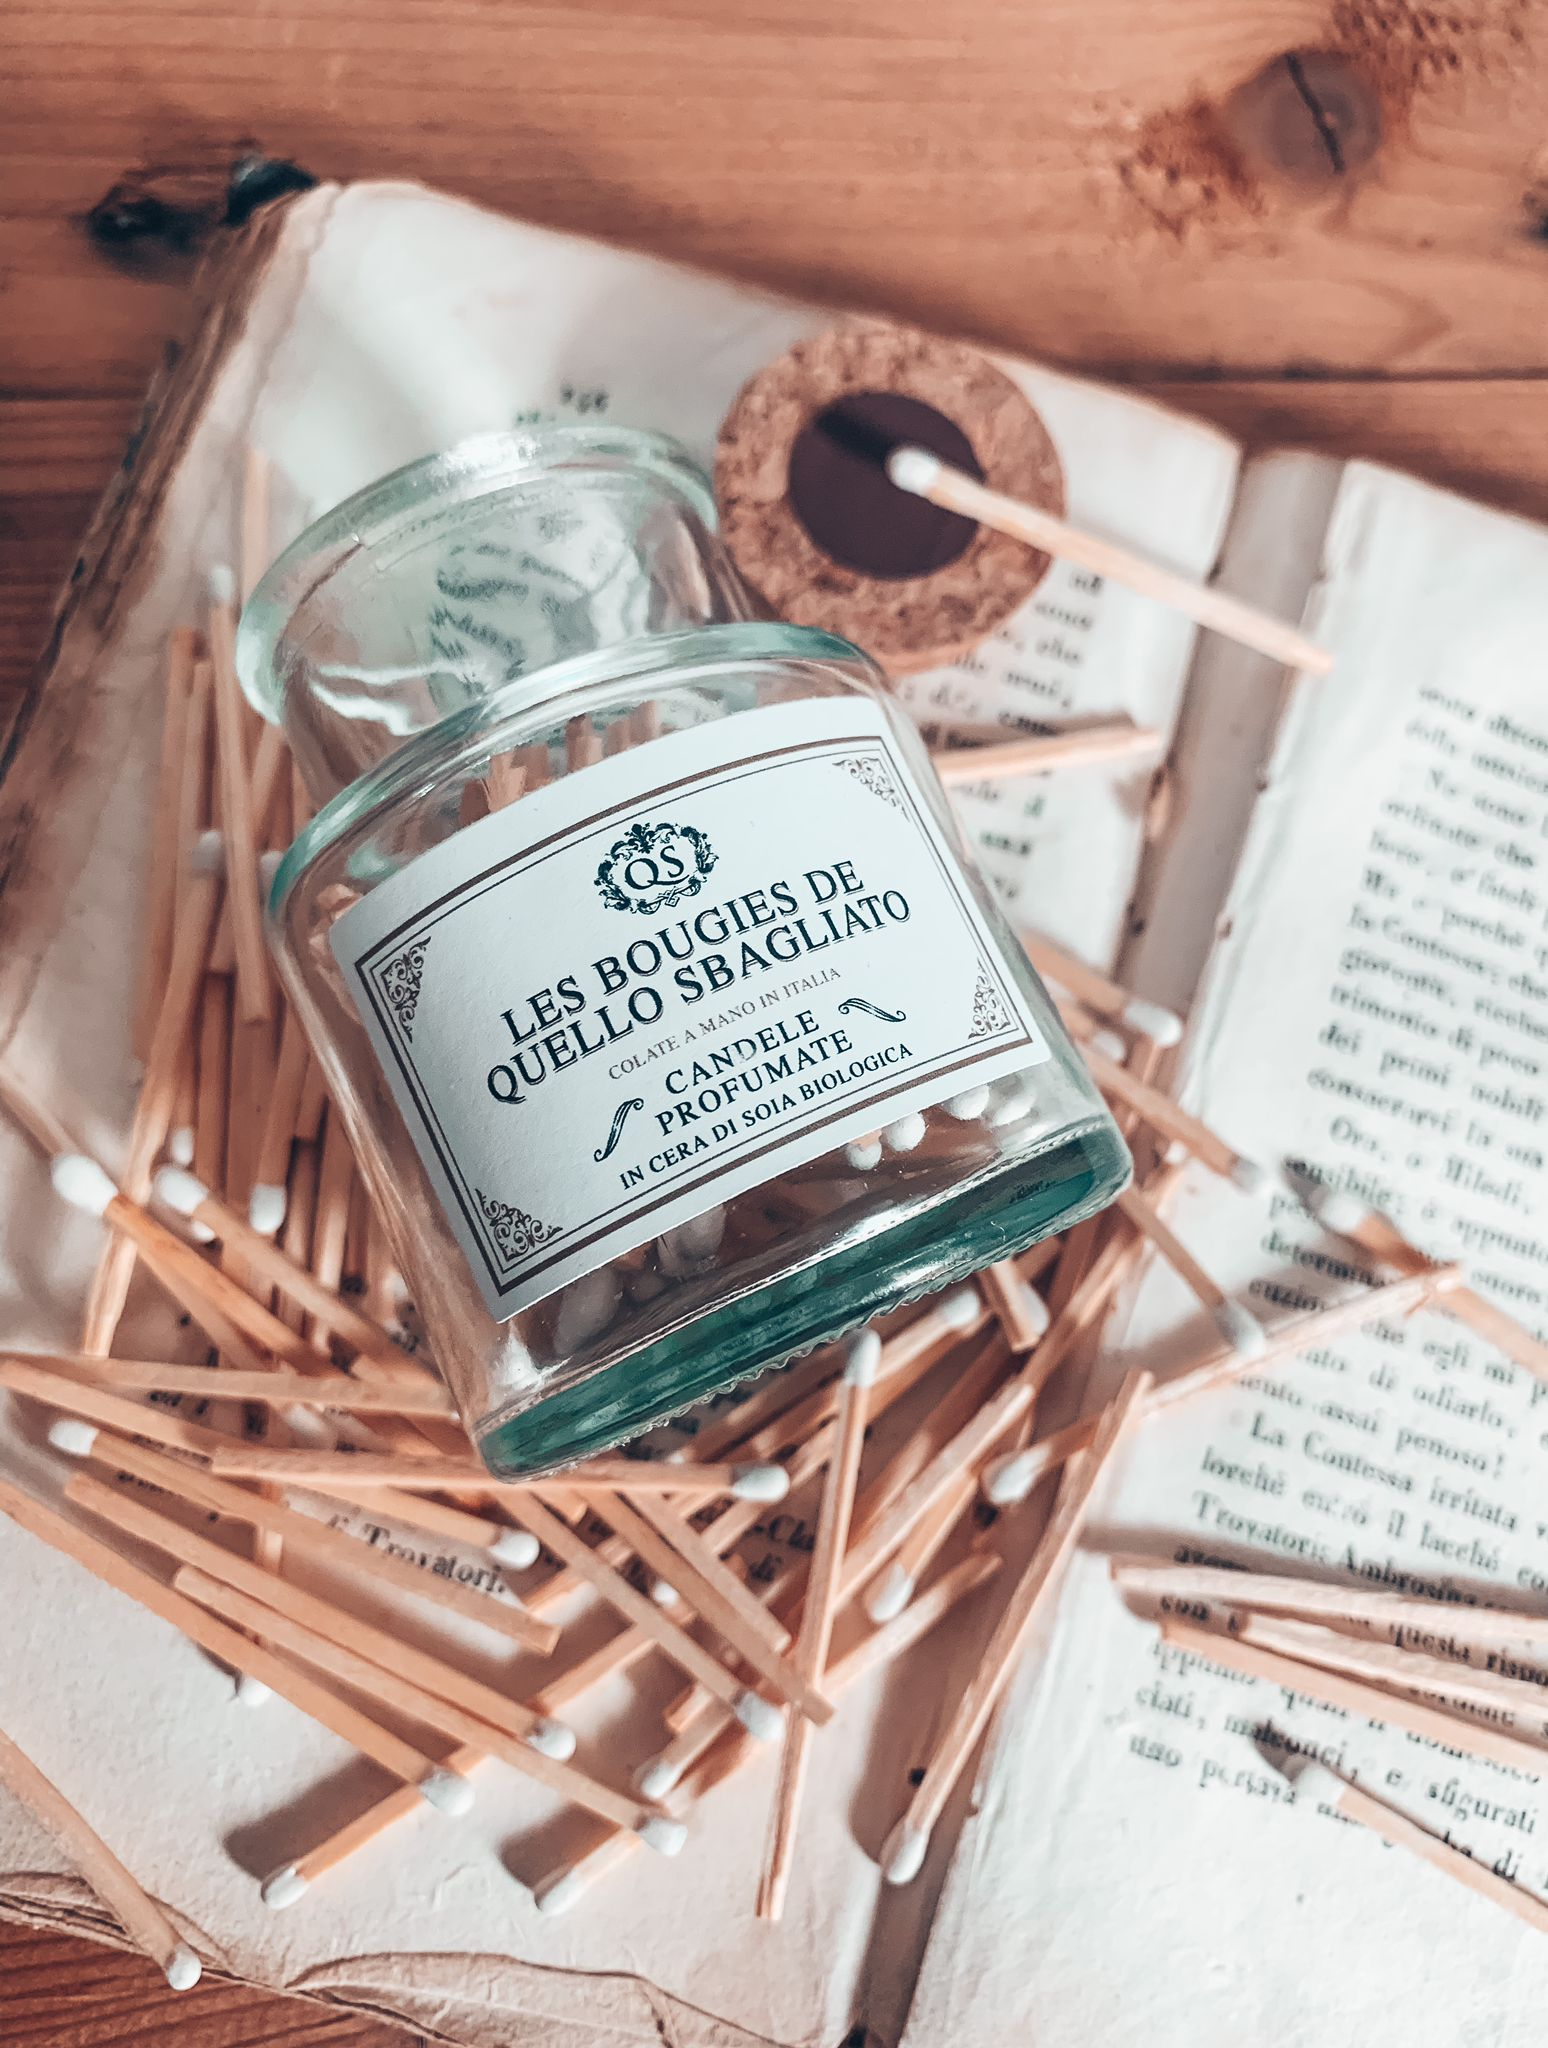 fiammiferi matches per accensione candele in cera di soia colate in italia artigianali